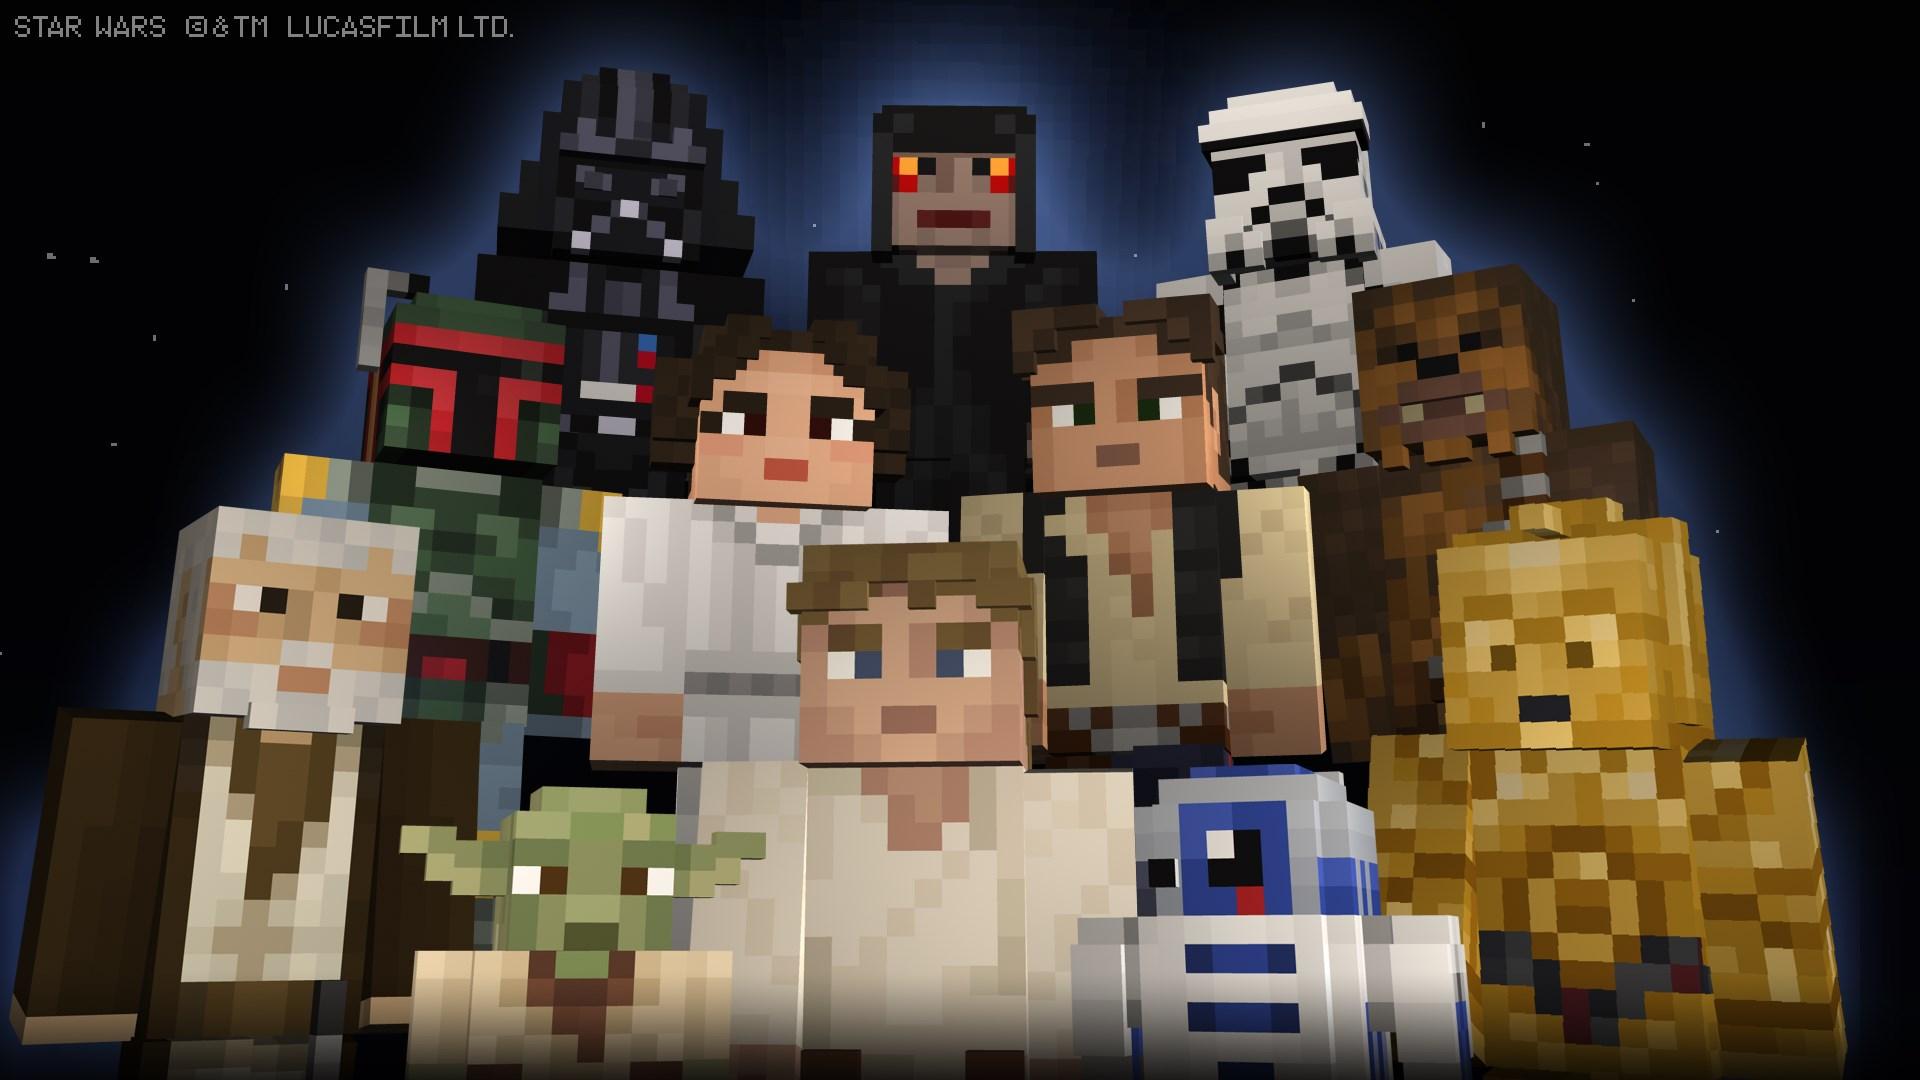 7. Star Wars Classic Skin Pack